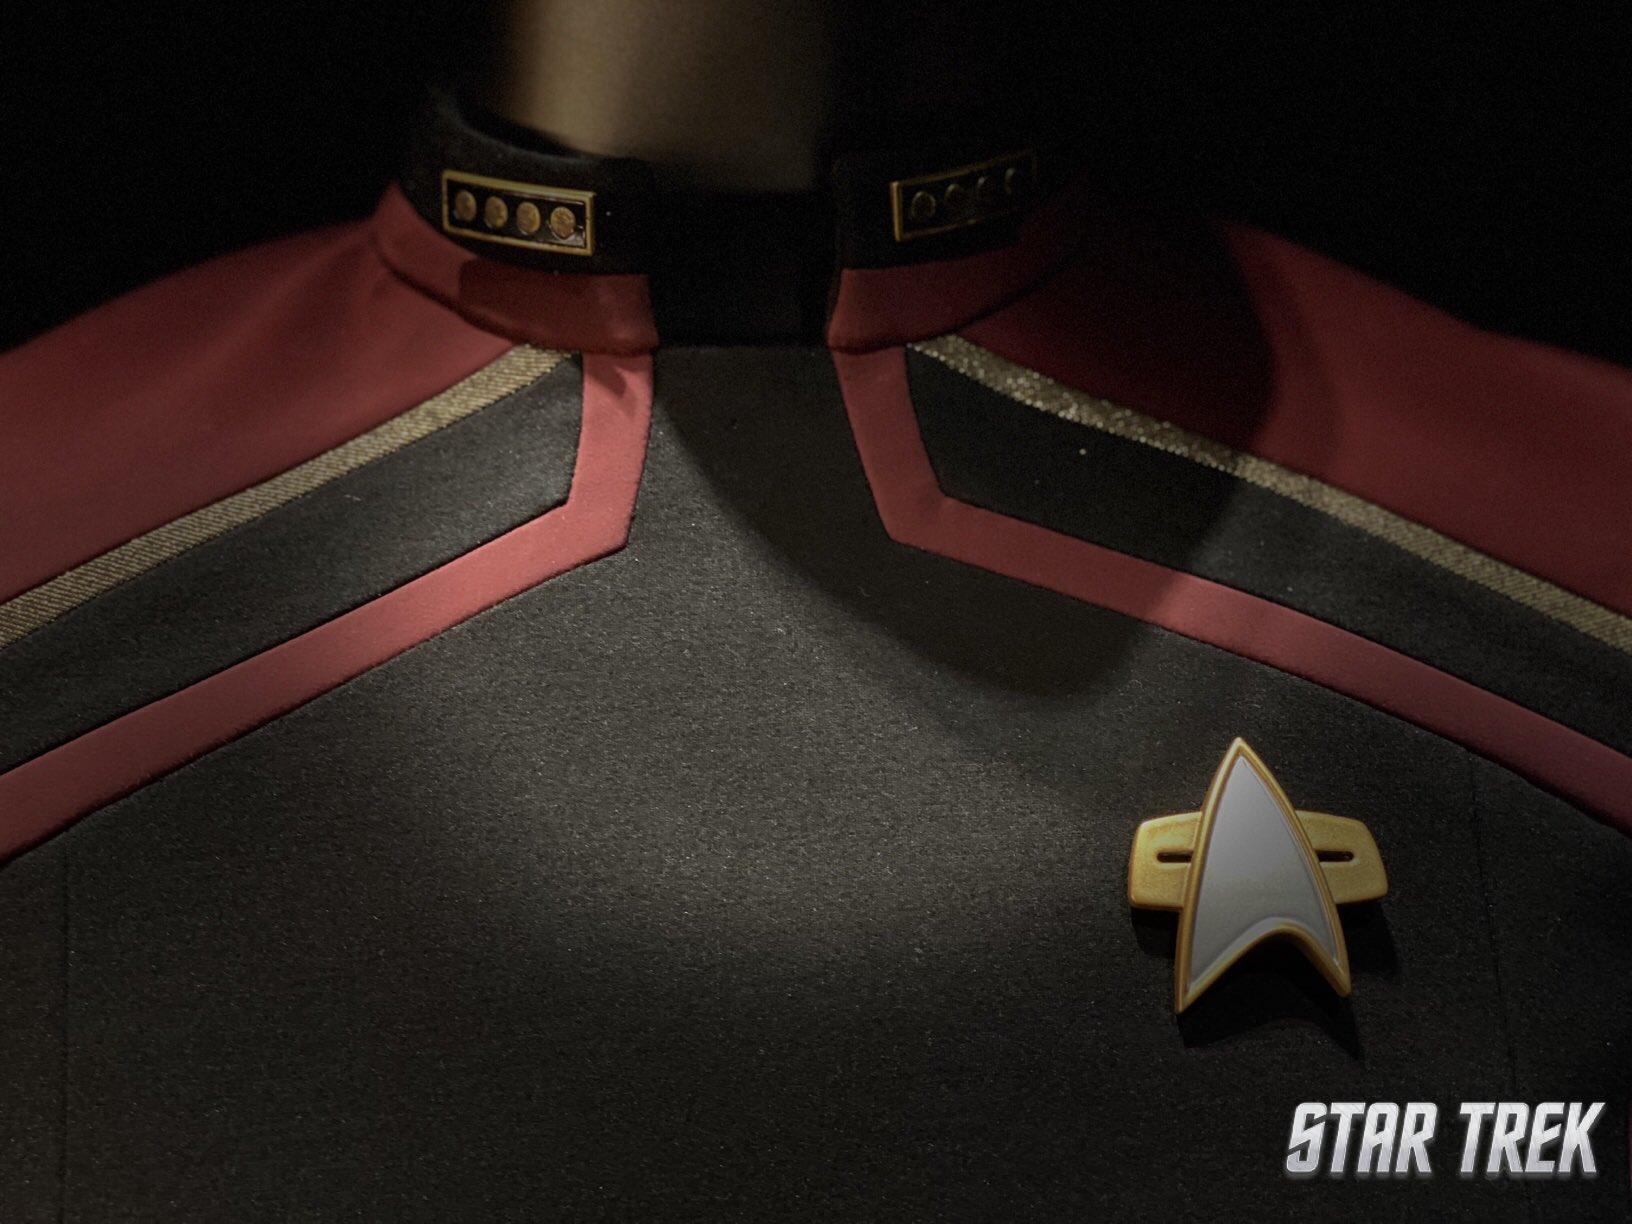 [Série] Star Trek Picard - Page 4 EHuykIBXYAIPTHJ?format=jpg&name=large